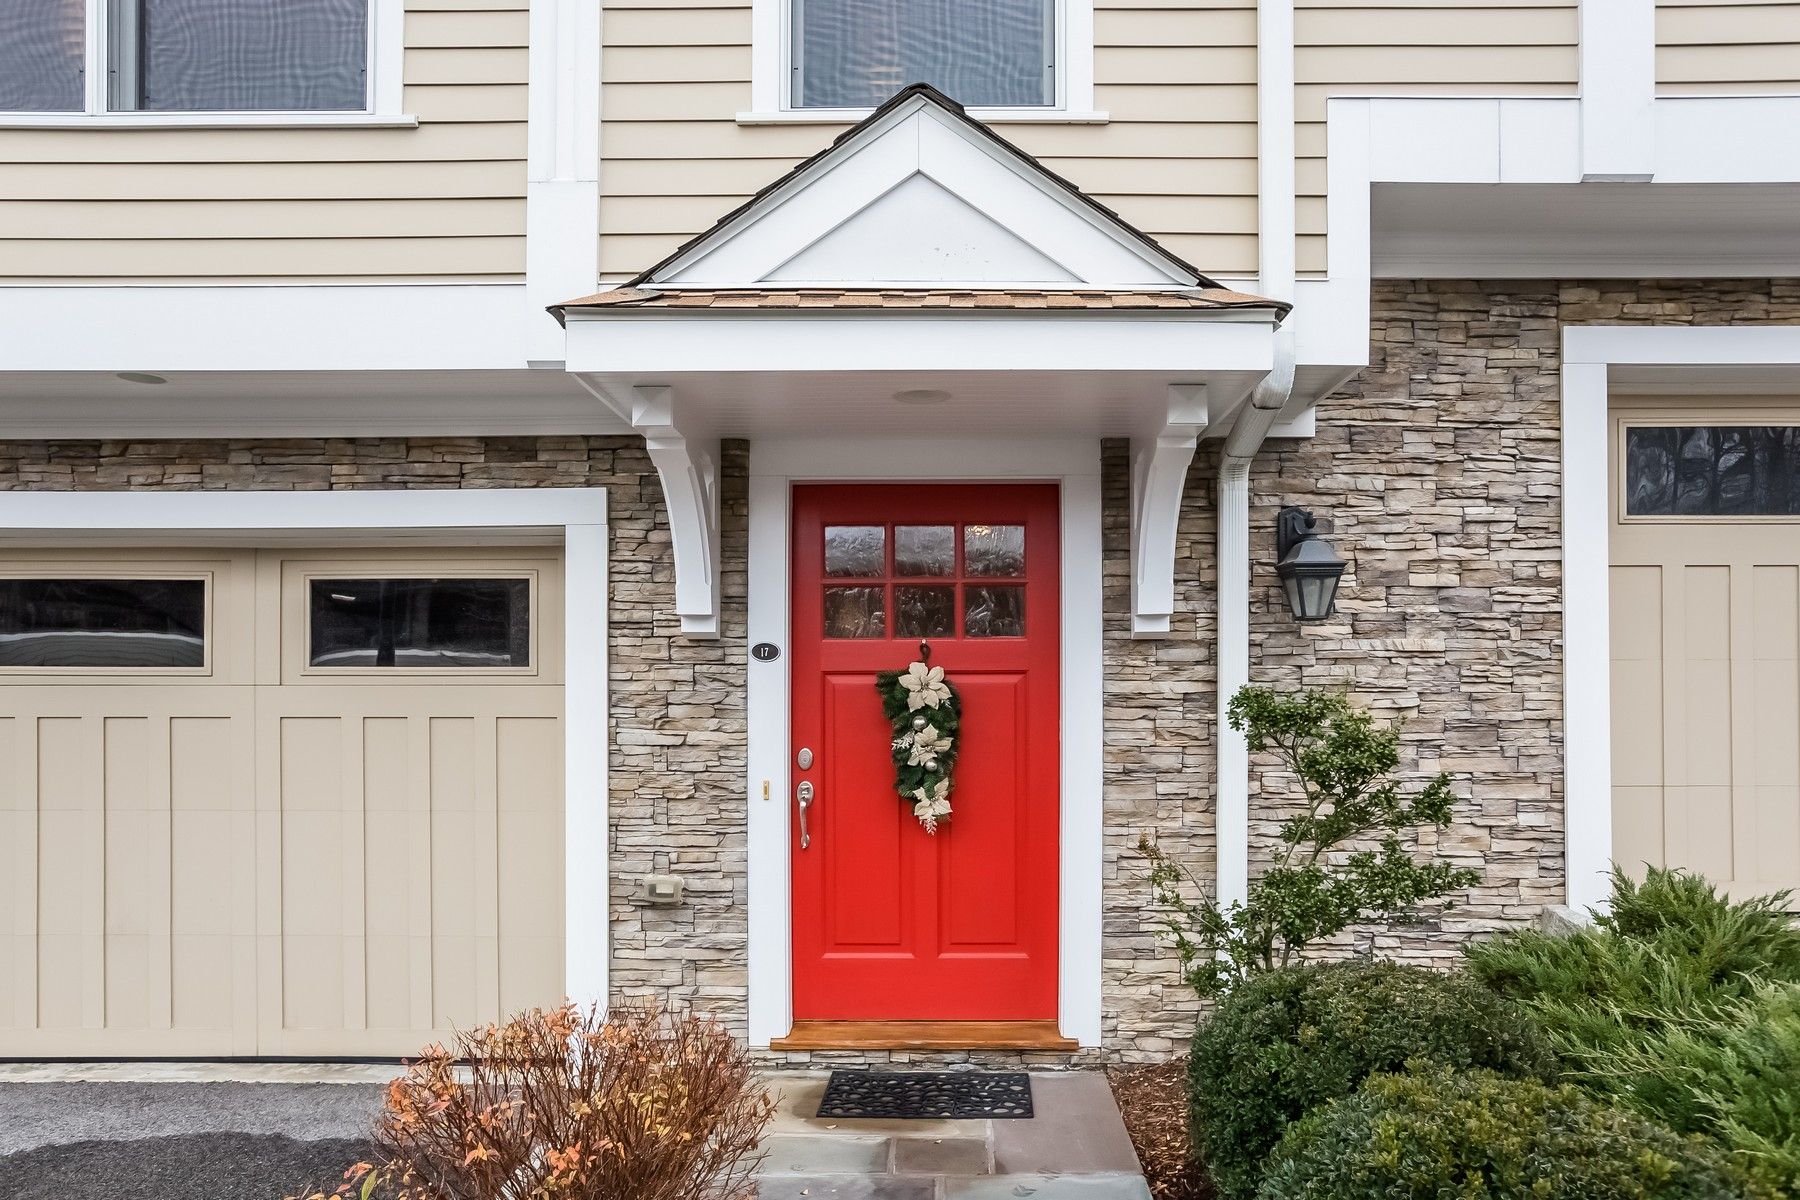 Condomínio para Venda às Stunning Townhouse 66 Grove Street C17 Ridgefield, Connecticut, 06877 Estados Unidos